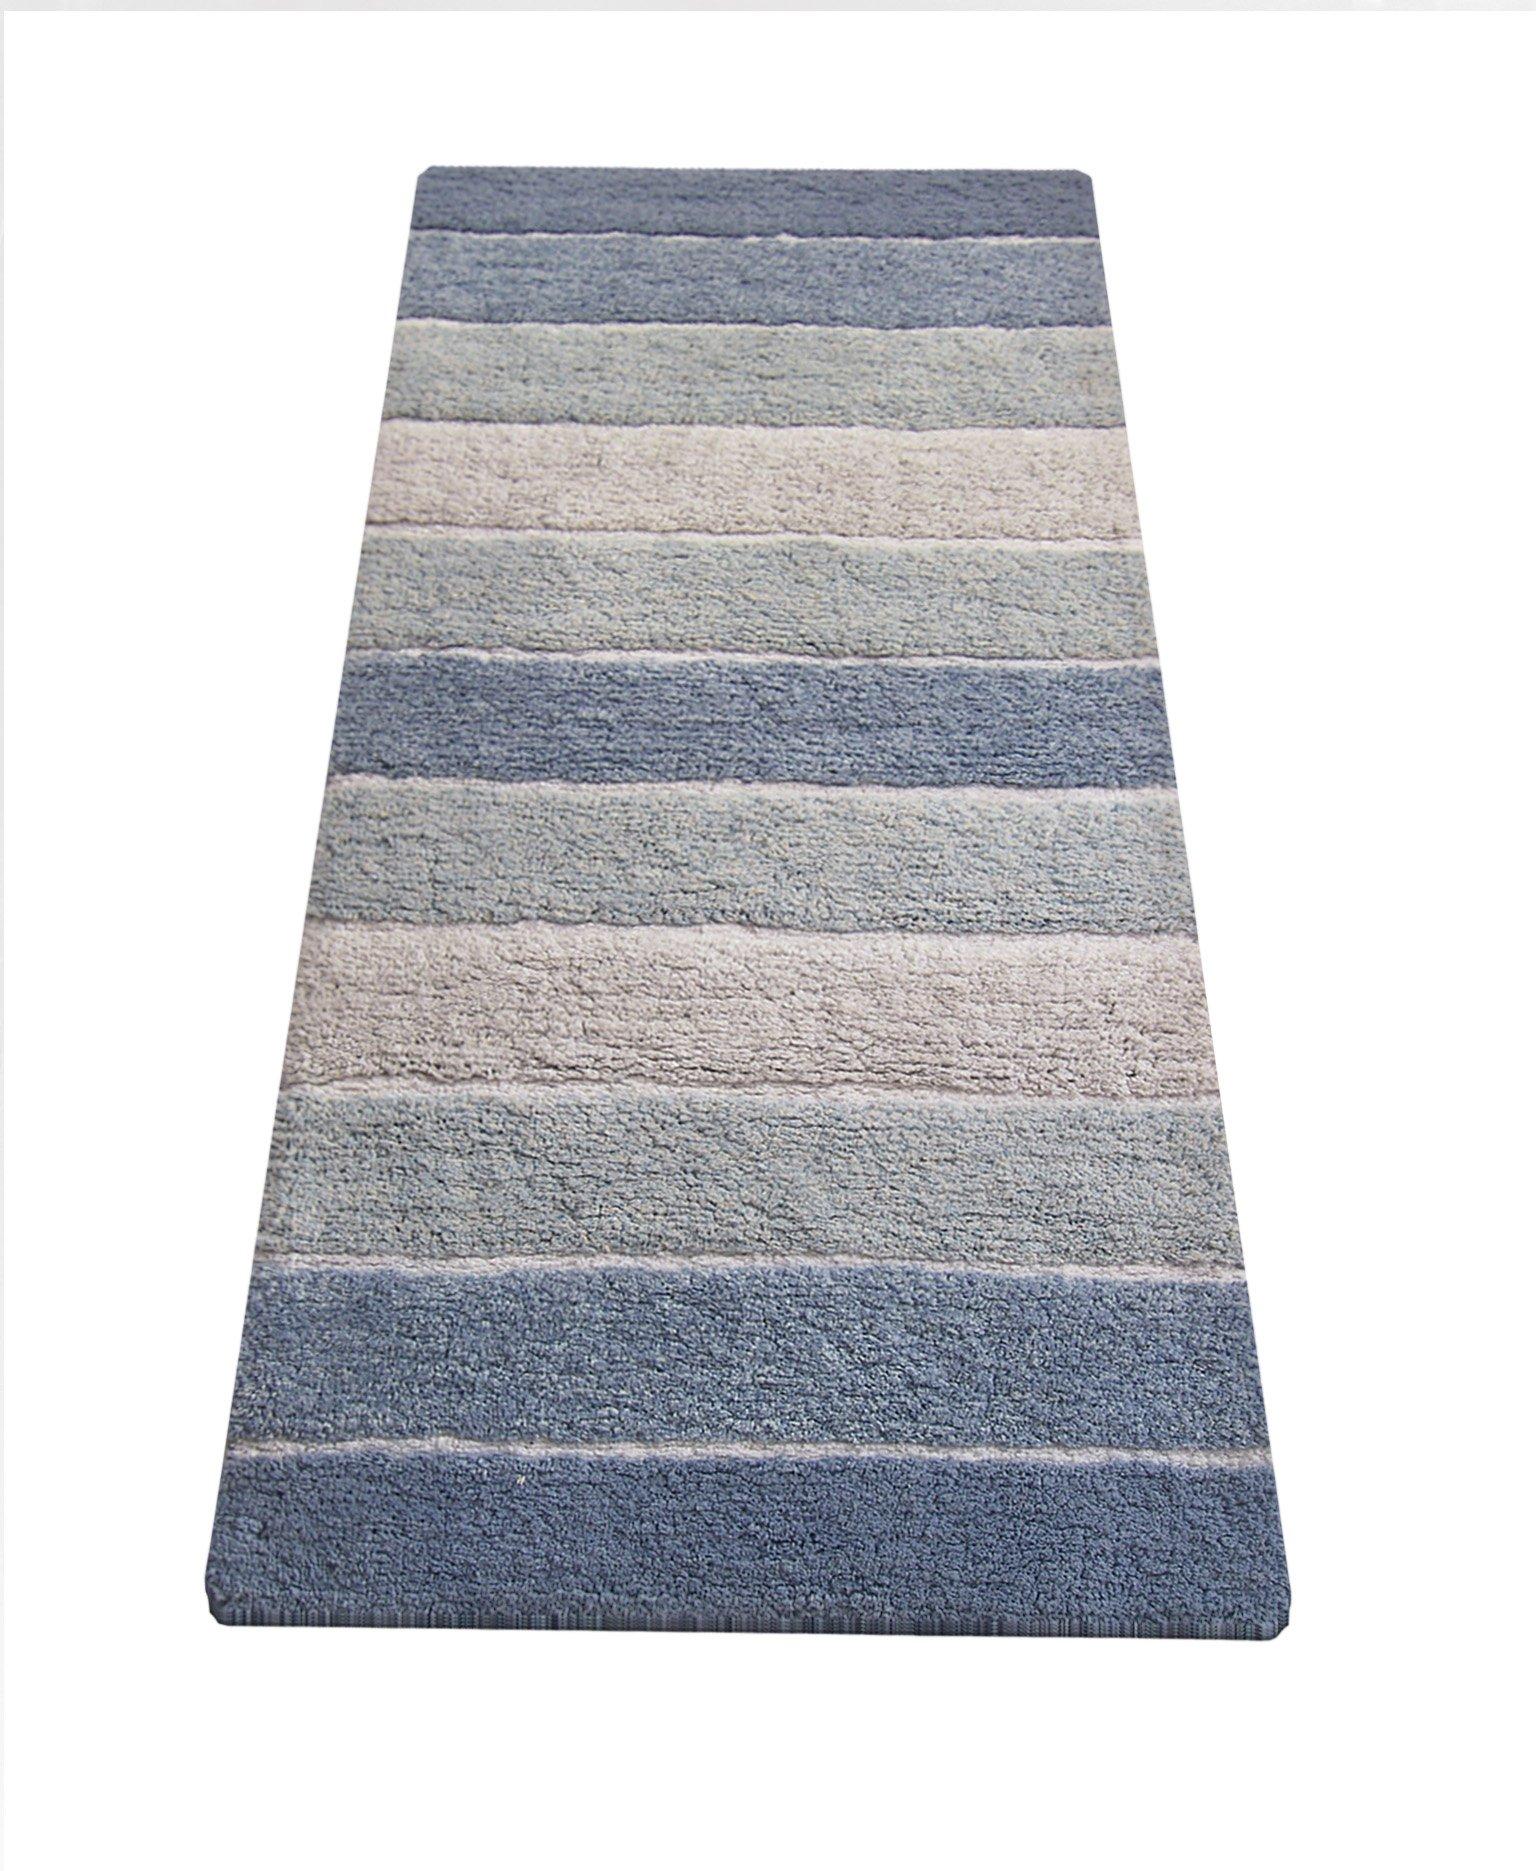 Chardin home Cordural Stripe Bath Runner, Blues with Latex Spray Non-Skid Backing, 24'' W x 60'' L